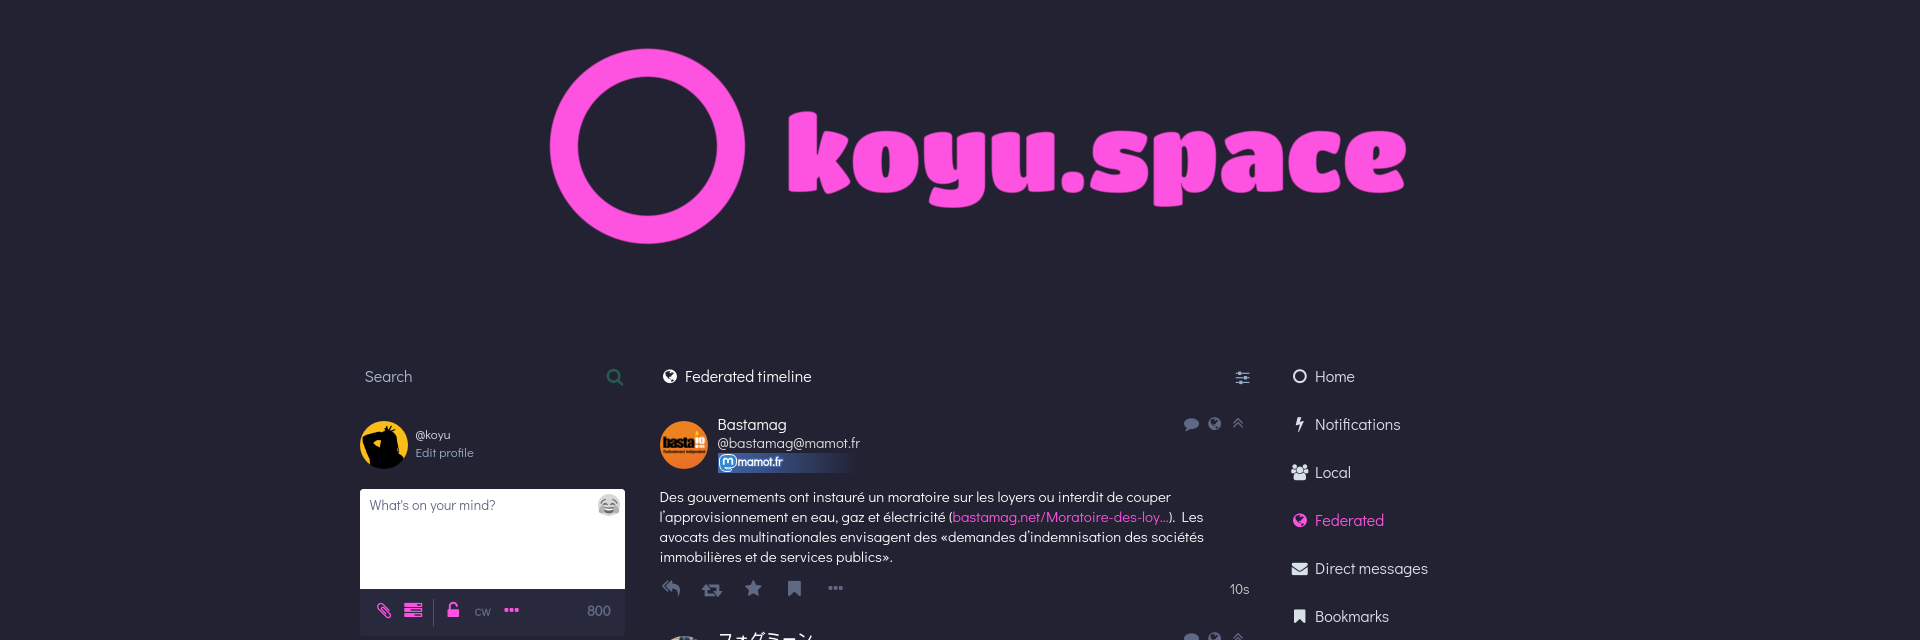 koyu.space banner